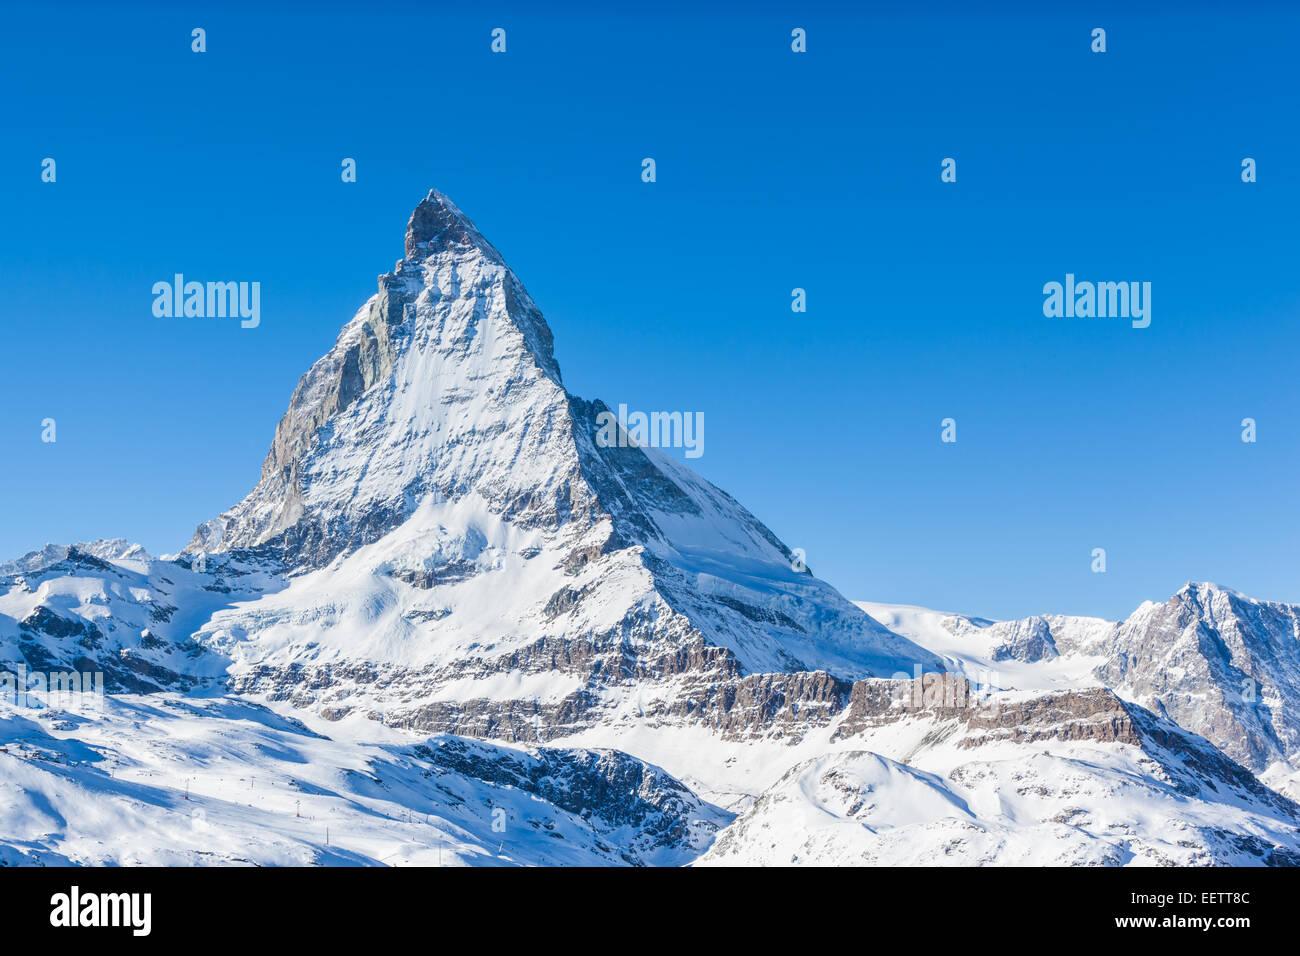 View of Matterhorn on a clear sunny day on the winter hiking path, Zermatt, Switzerland - Stock Image